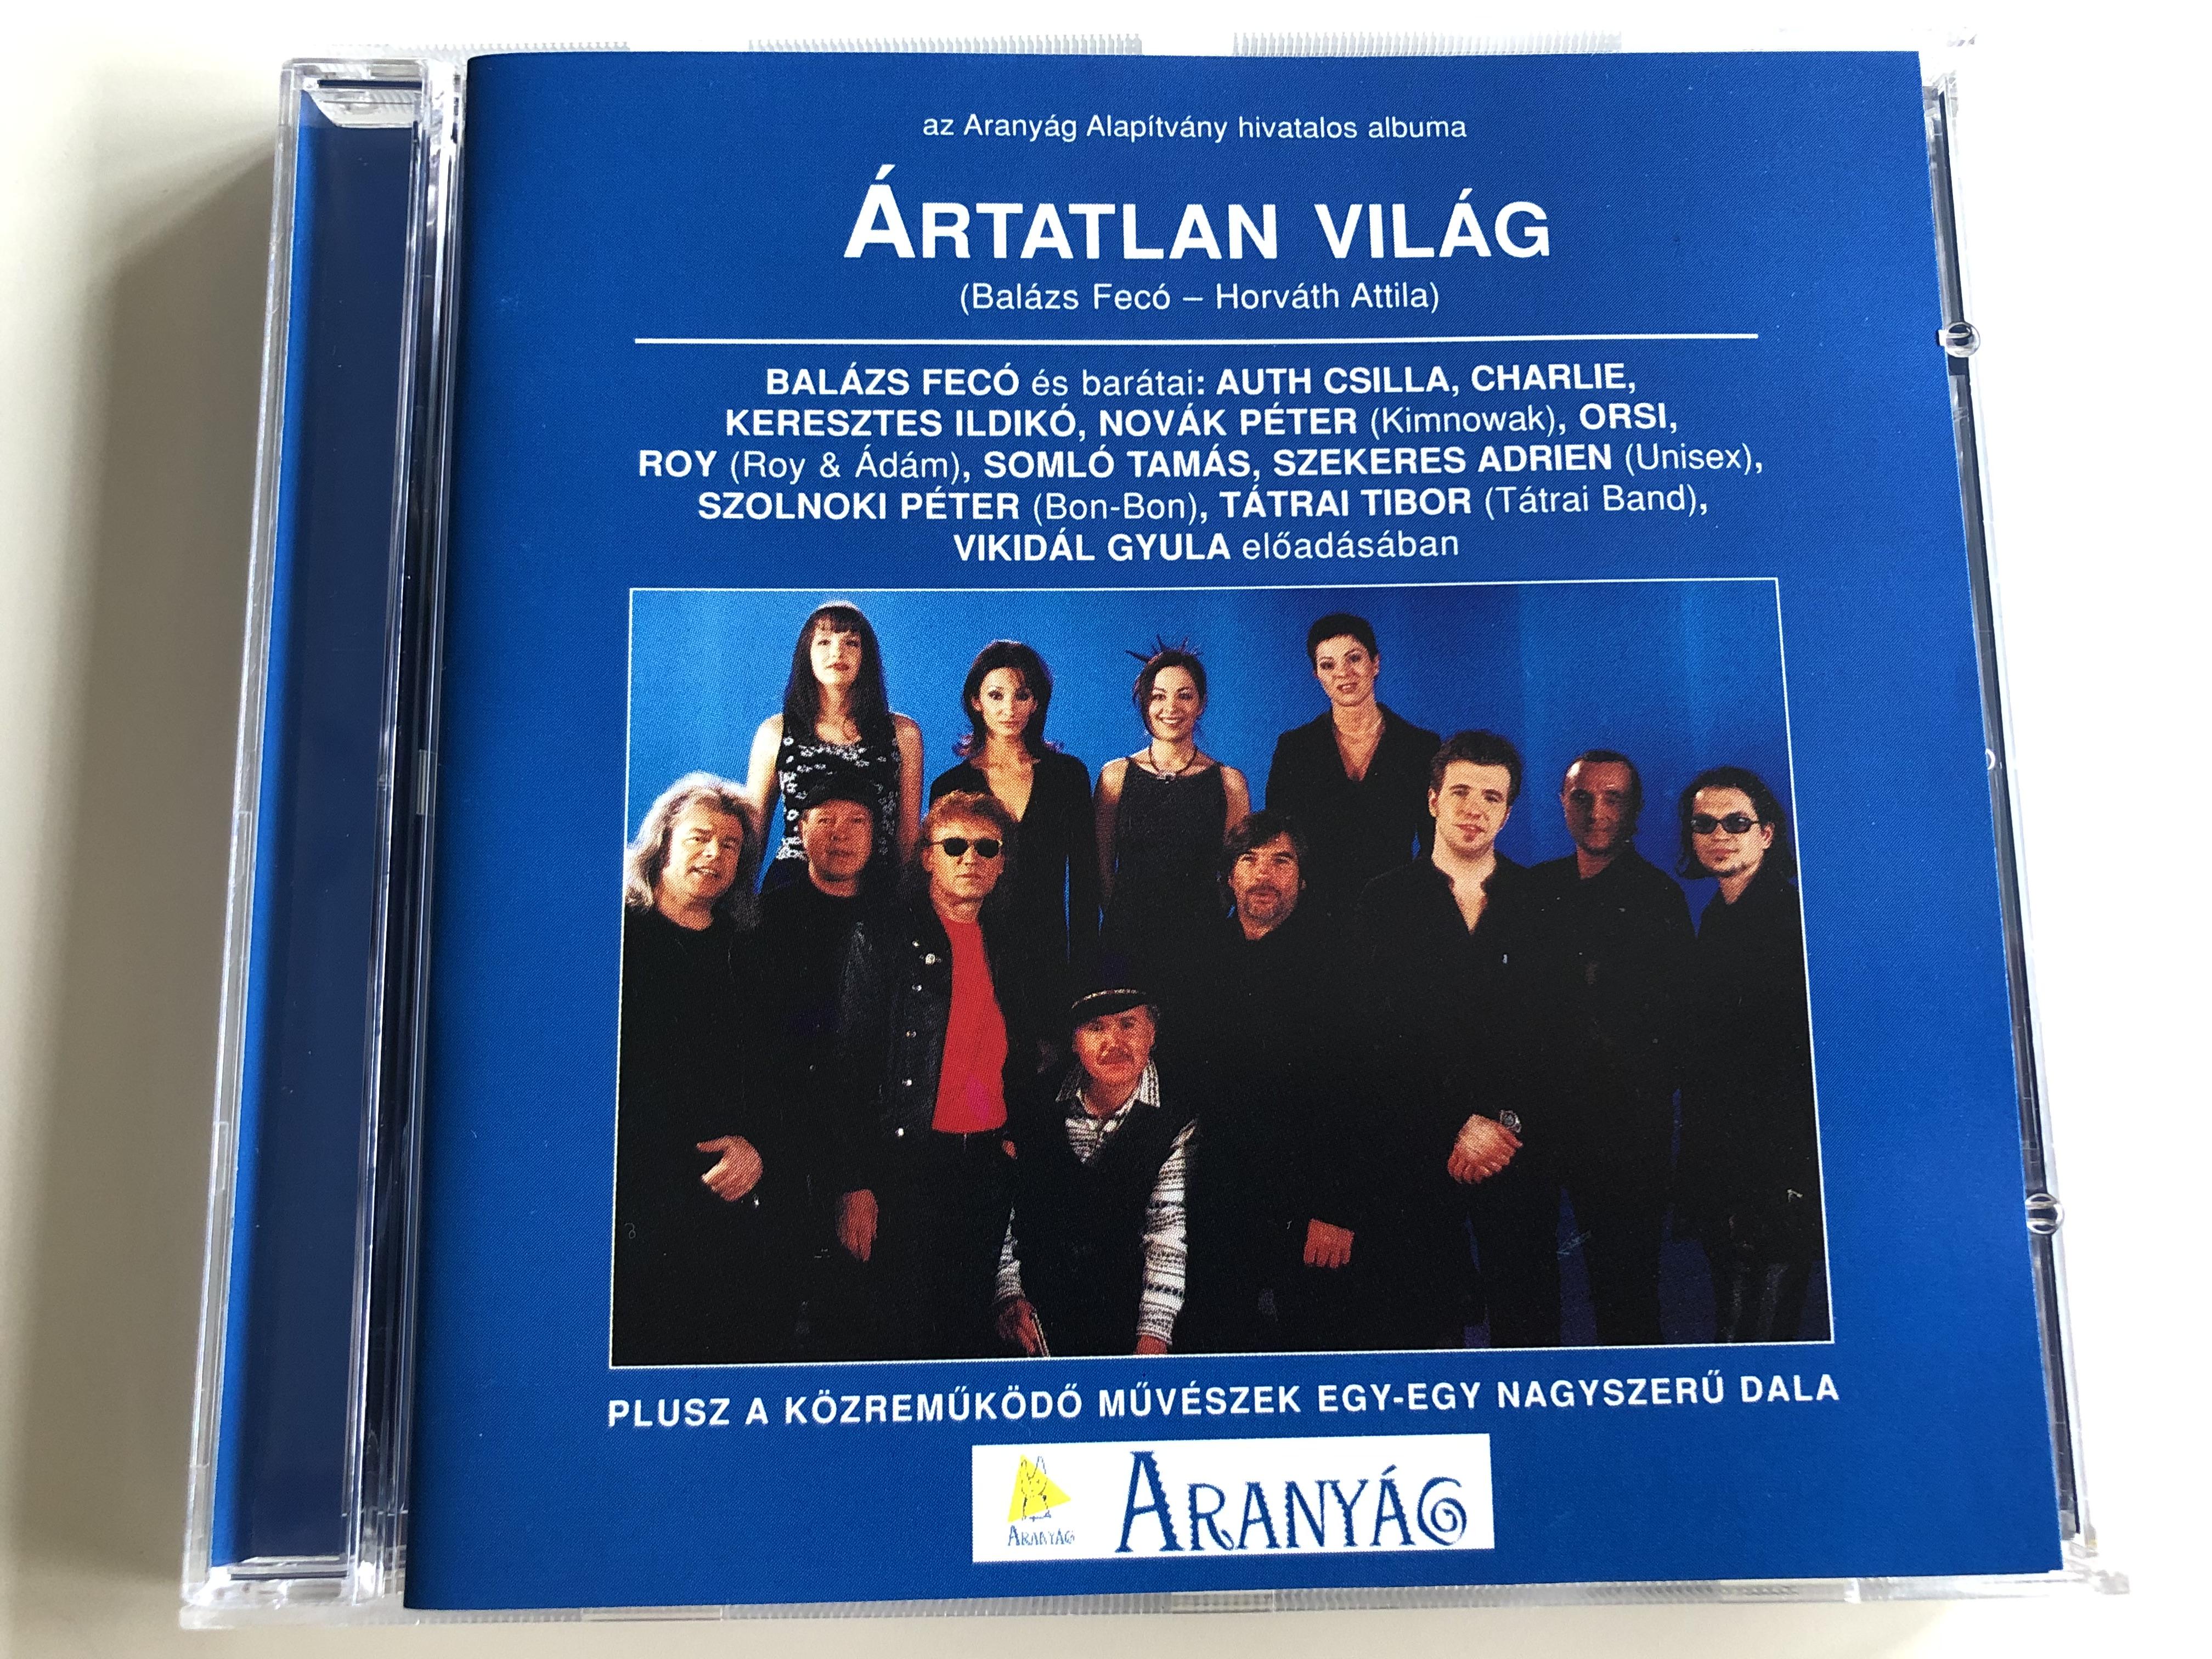 bal-zs-fec-horv-th-attila-rtatlan-vil-g-audio-cd-1999-arany-g-alap-tv-ny-bal-zs-fec-and-friends-auth-csilla-charlie-keresztes-ildik-kimnowak-orsi-roy-d-m-soml-tam-s-unisex-bon-bon-t-trai-band-vikid-l-1-.jpg